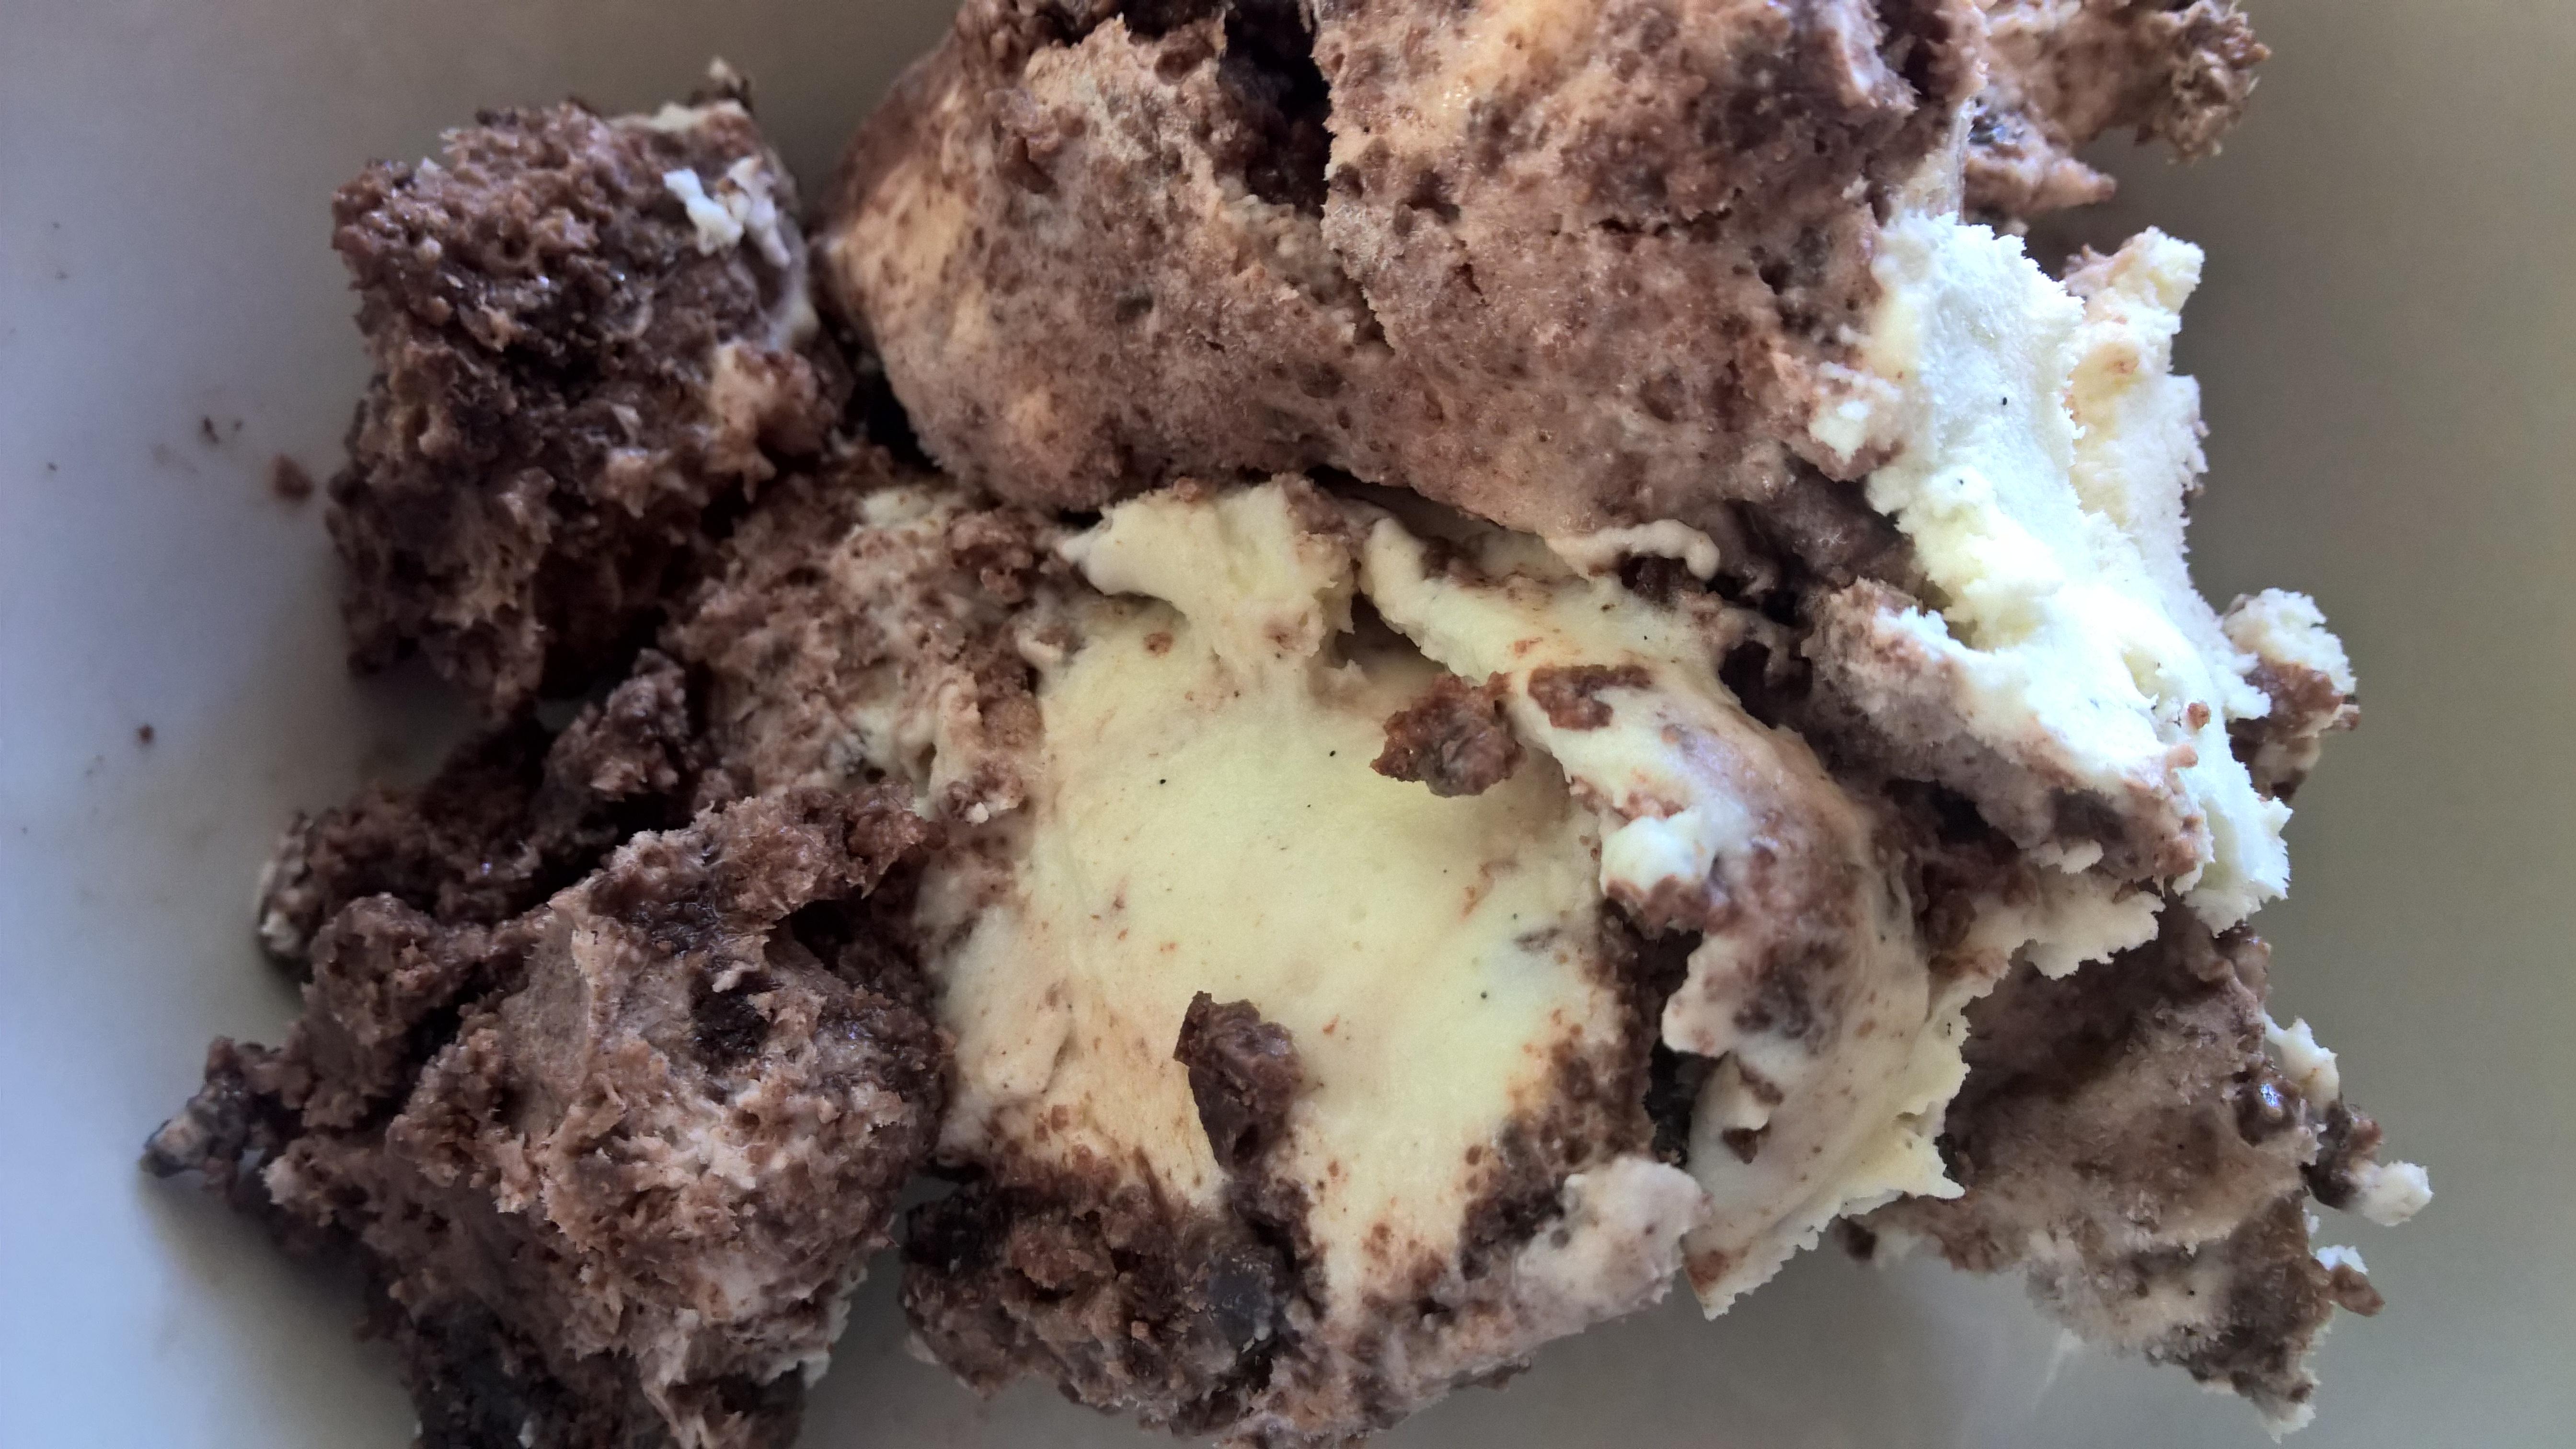 Zinfandel Brownie Swirl Ice Cream